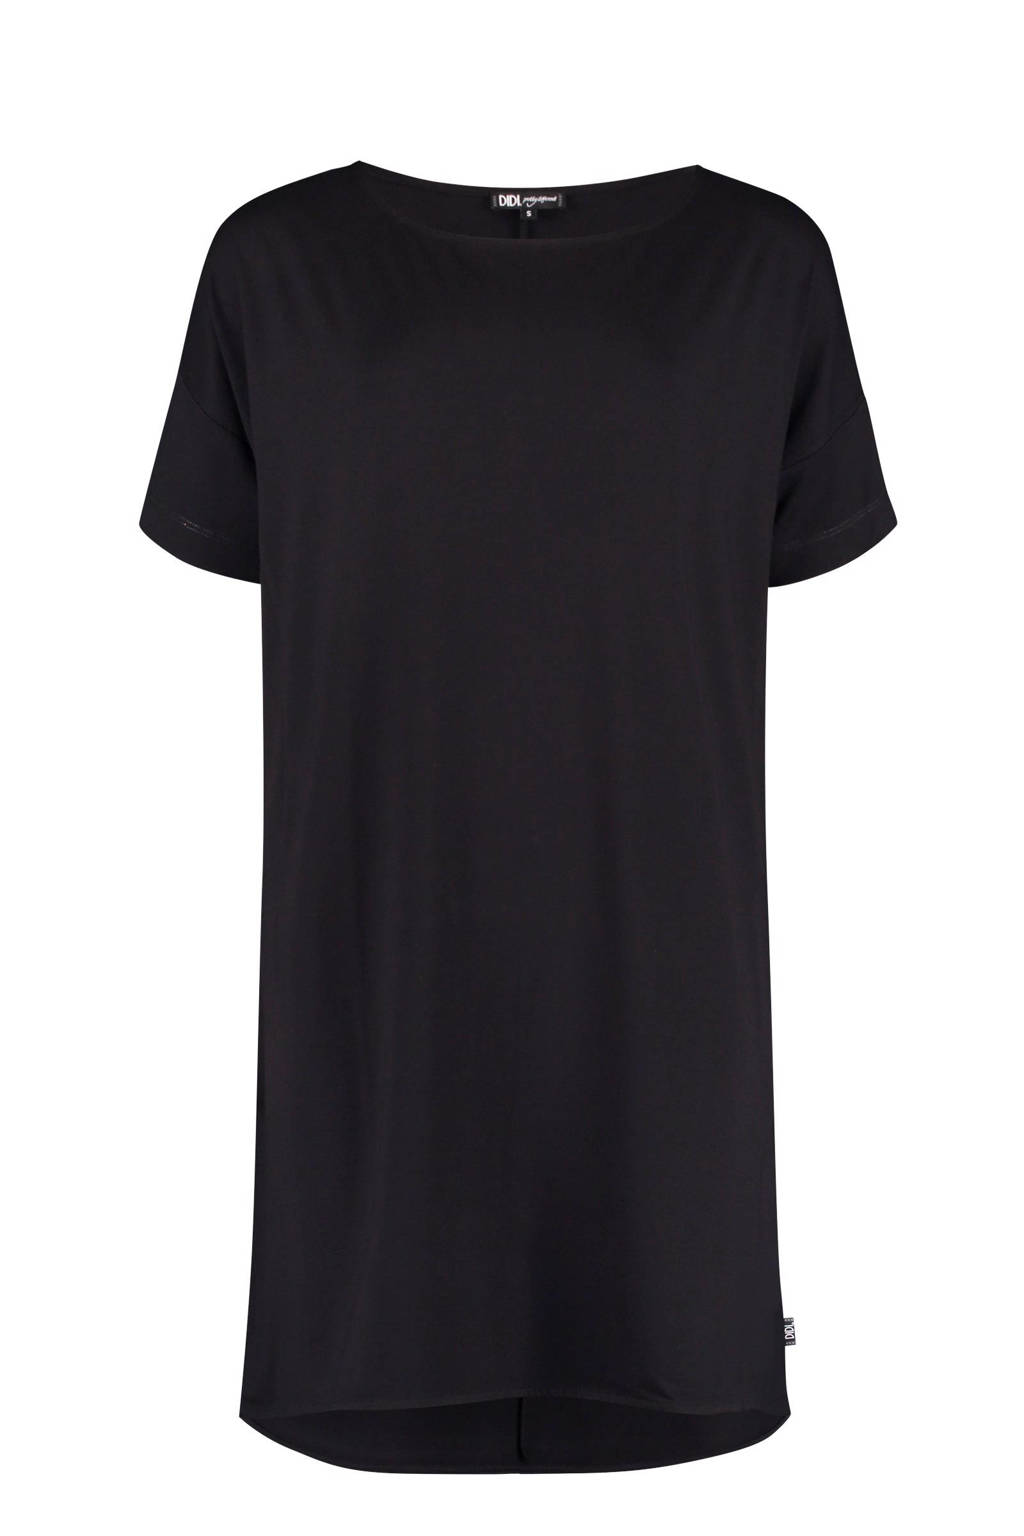 Didi A-lijn jurk zwart, Black